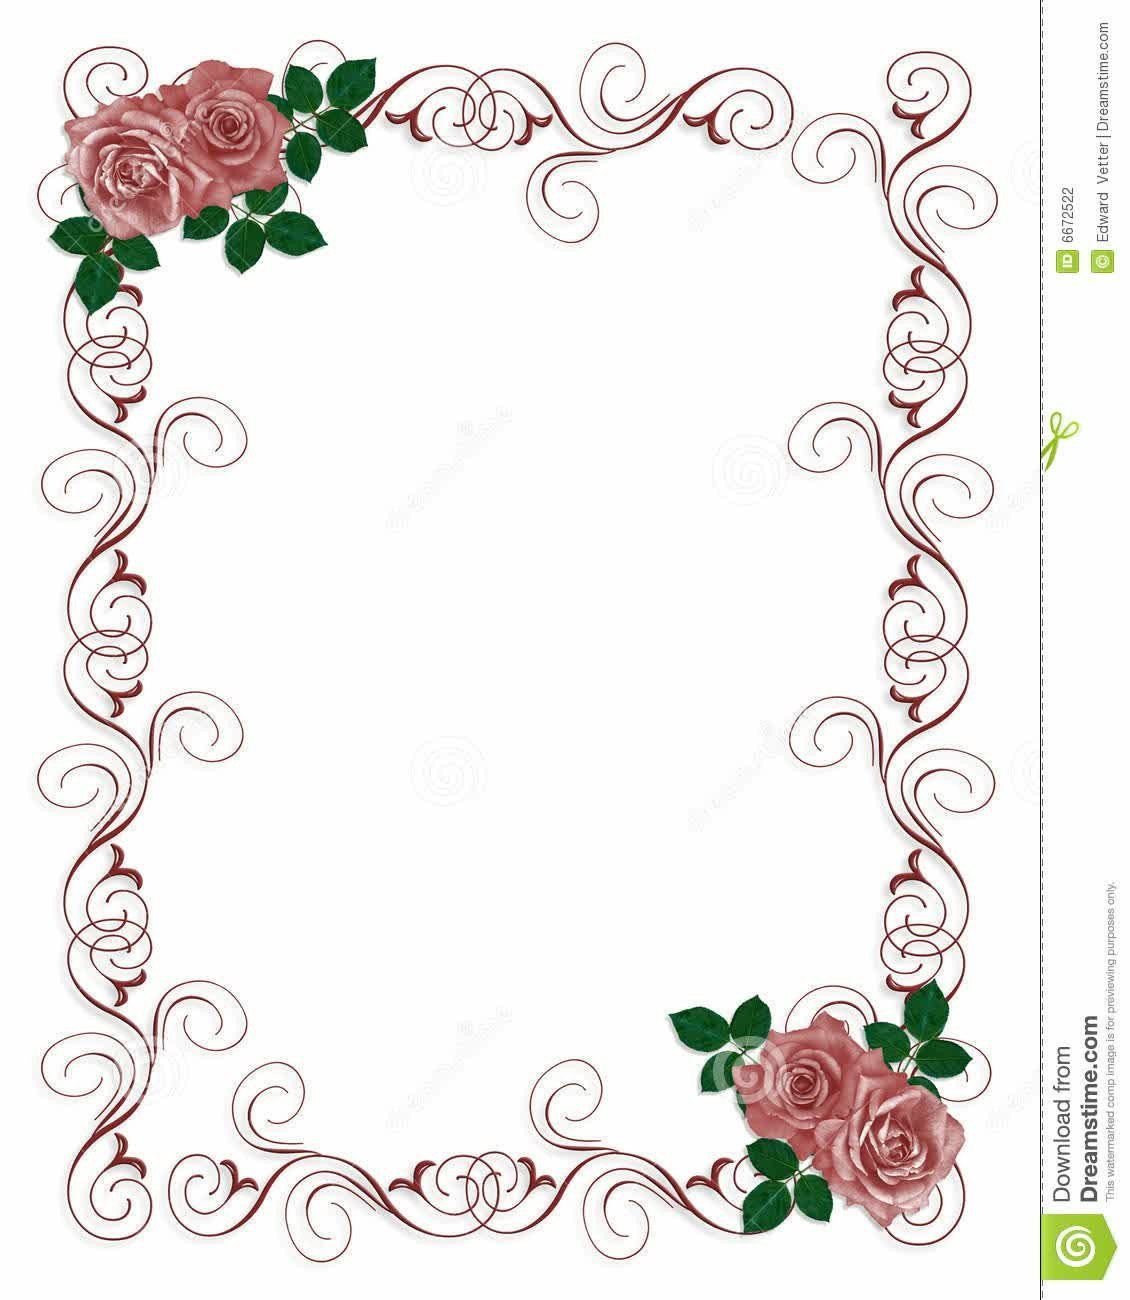 Free Blank Invitation Templates Floral Blank Wedding Invitation Templates